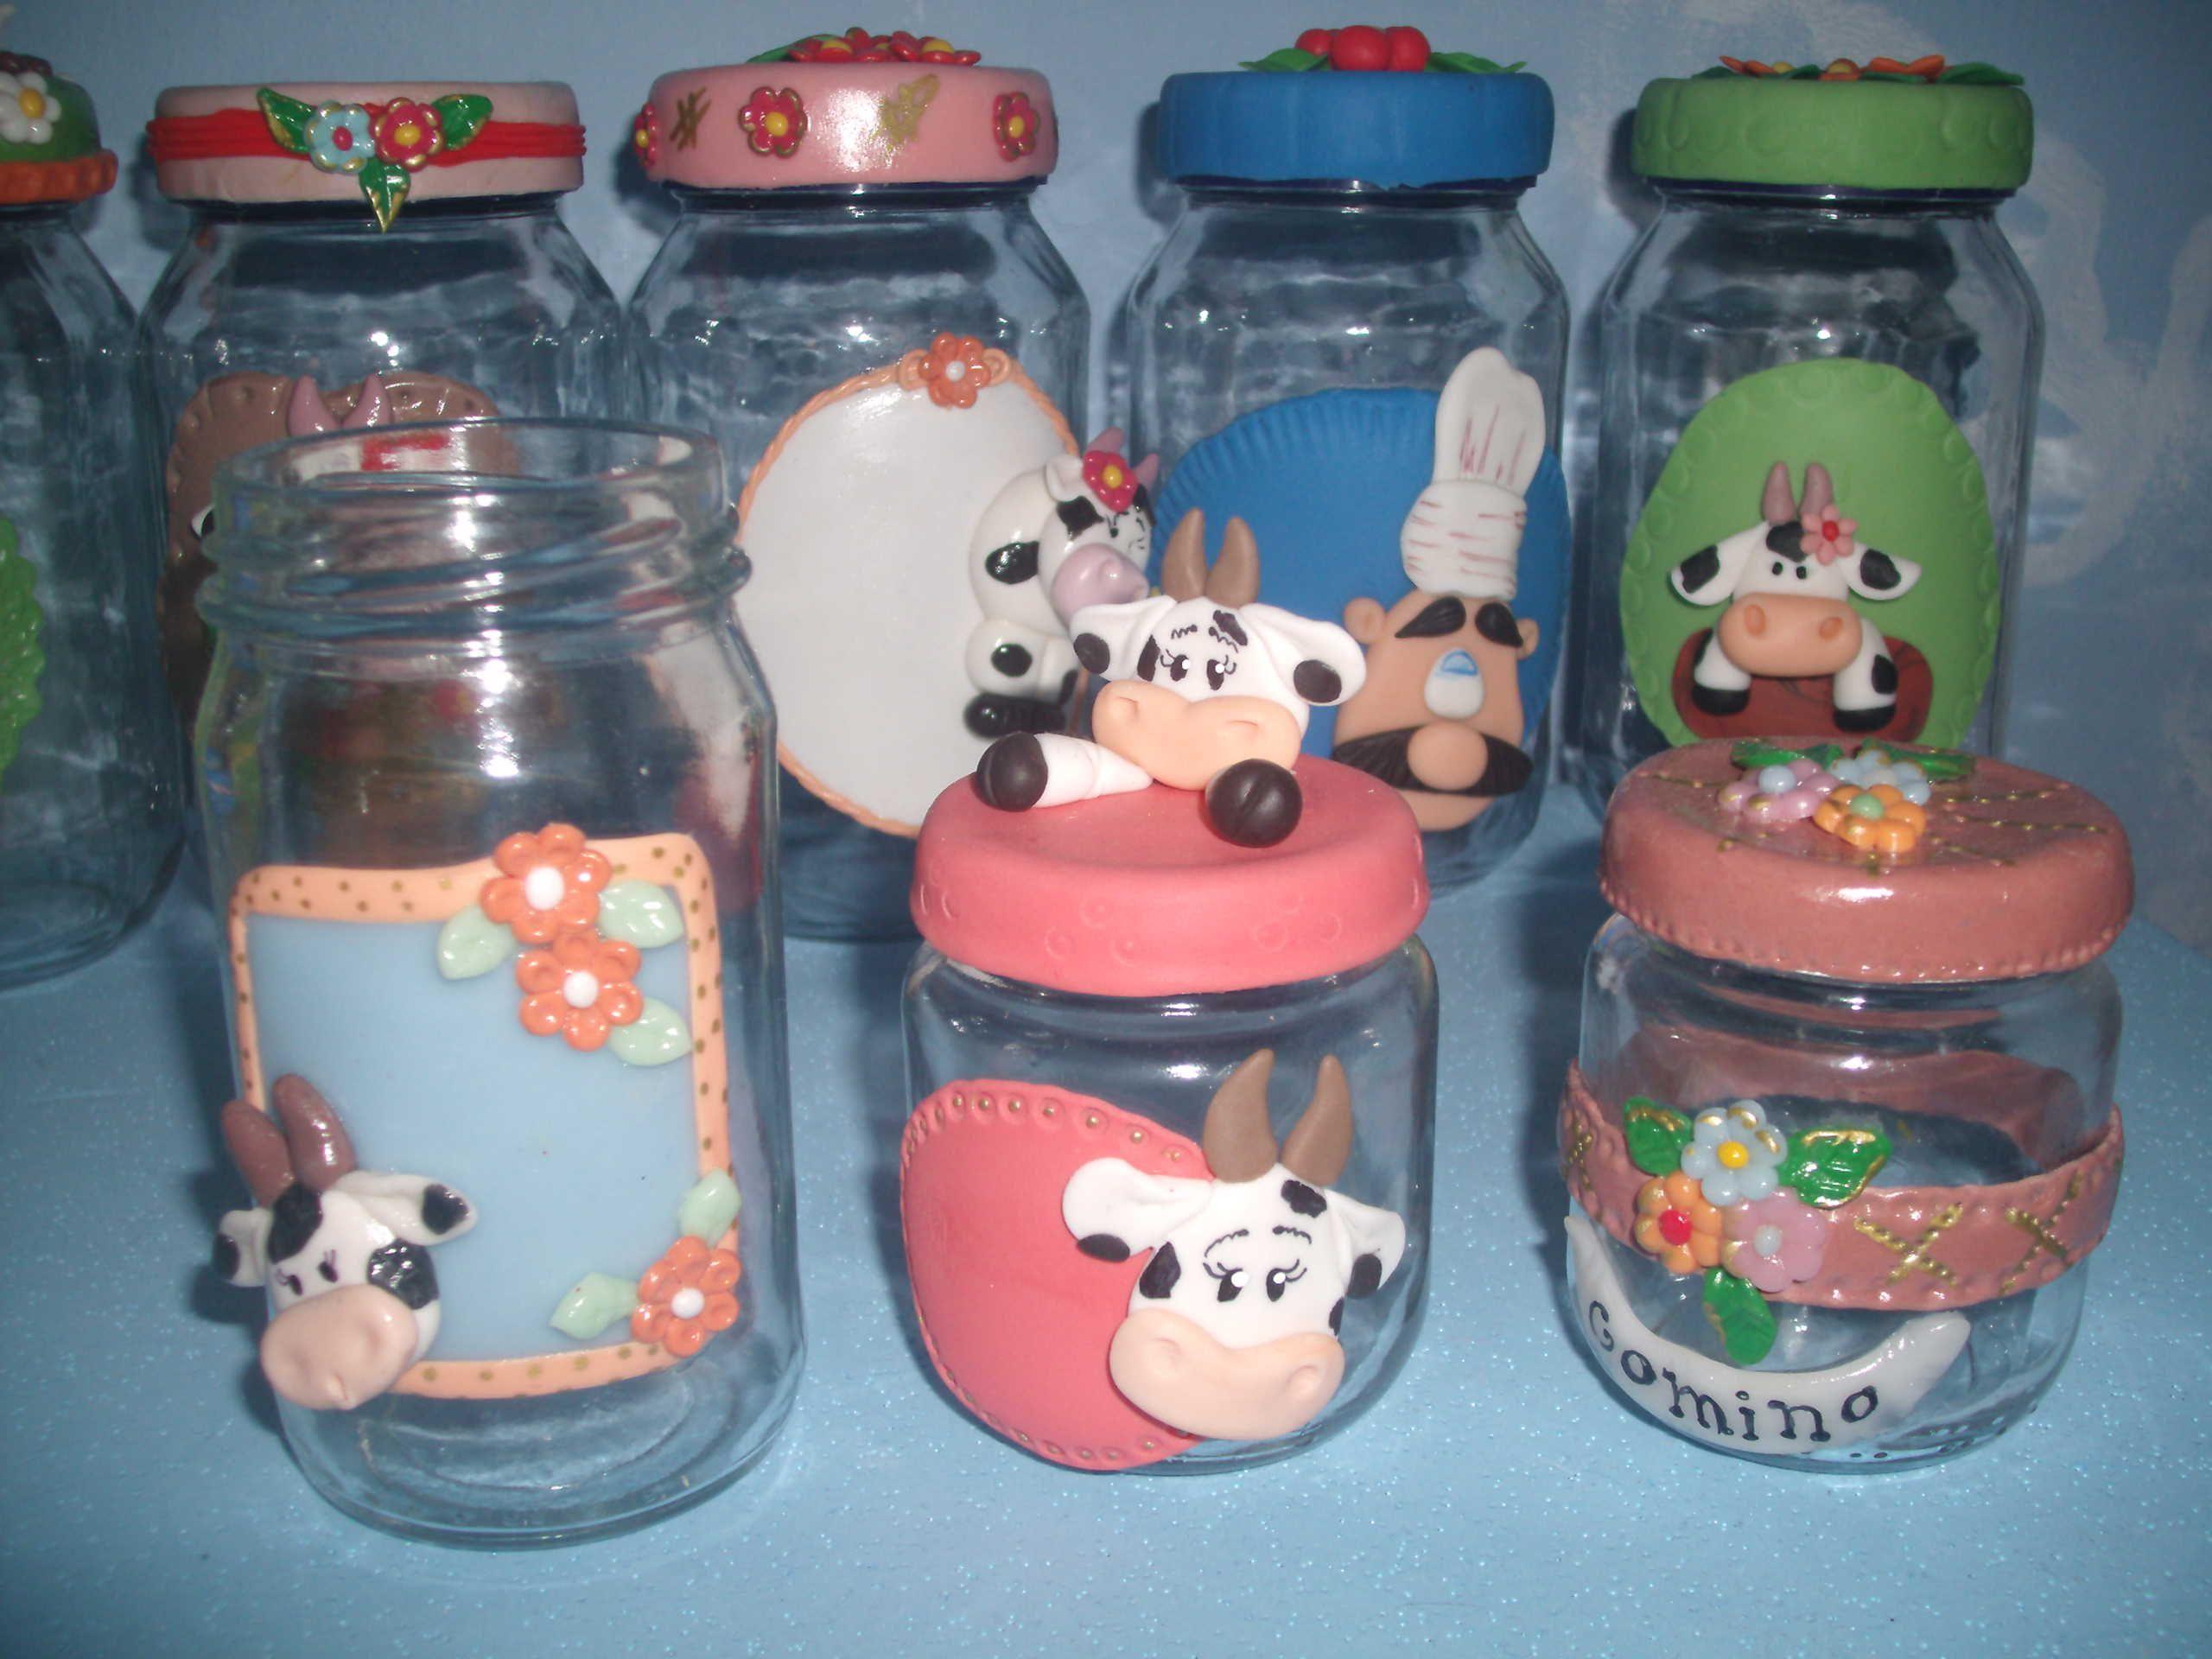 Frascos decorados frascos decorados pinterest for Envases de vidrio decorados